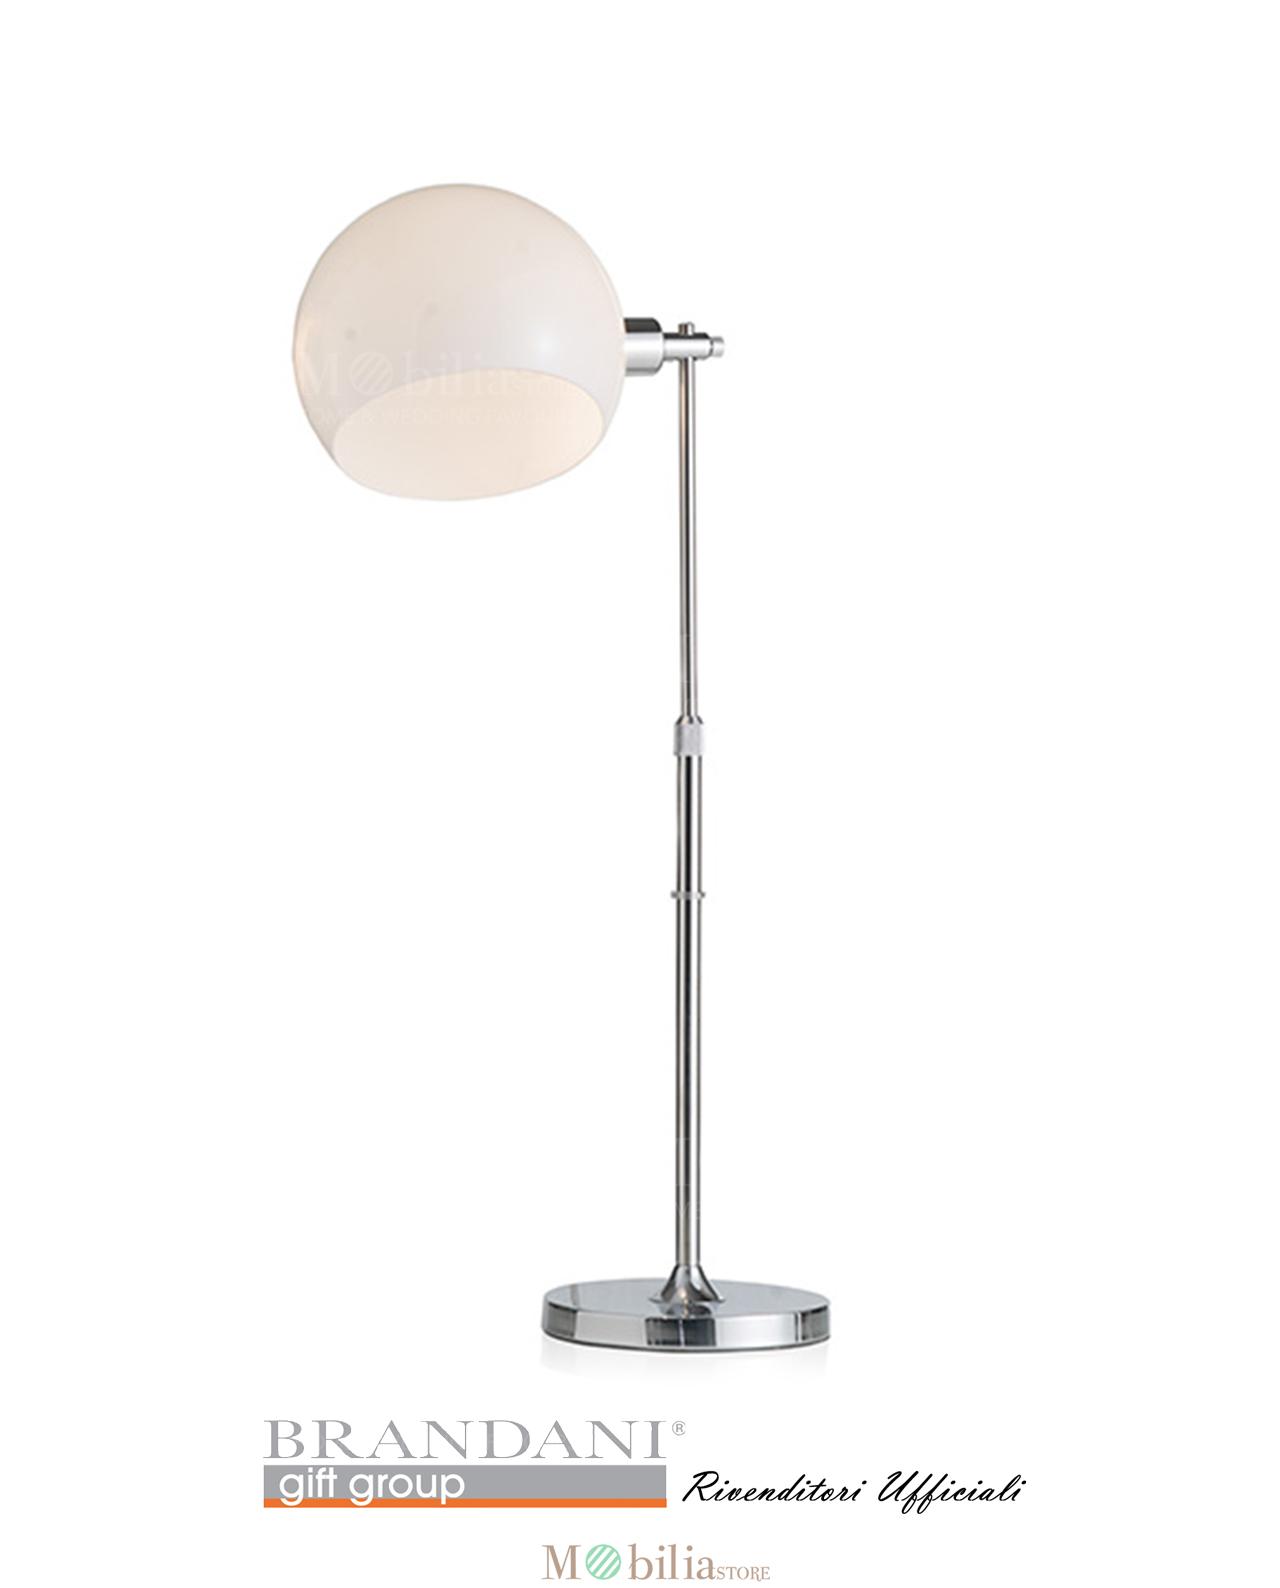 Lampade da terra moderne brandani for Lampade da scrivania moderne